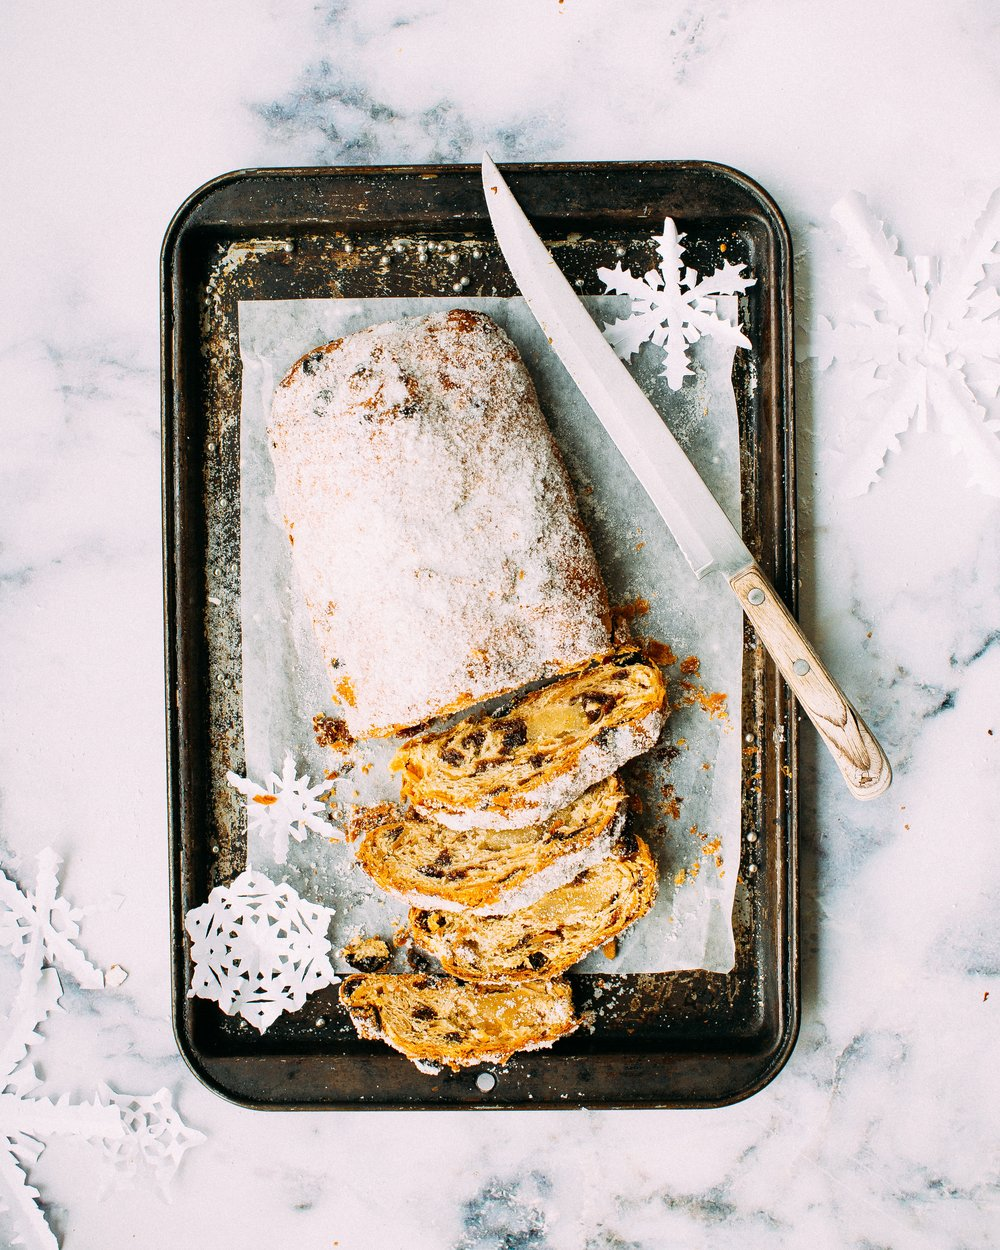 Photo by  Food Photographer | Jennifer Pallian  on  Unsplash